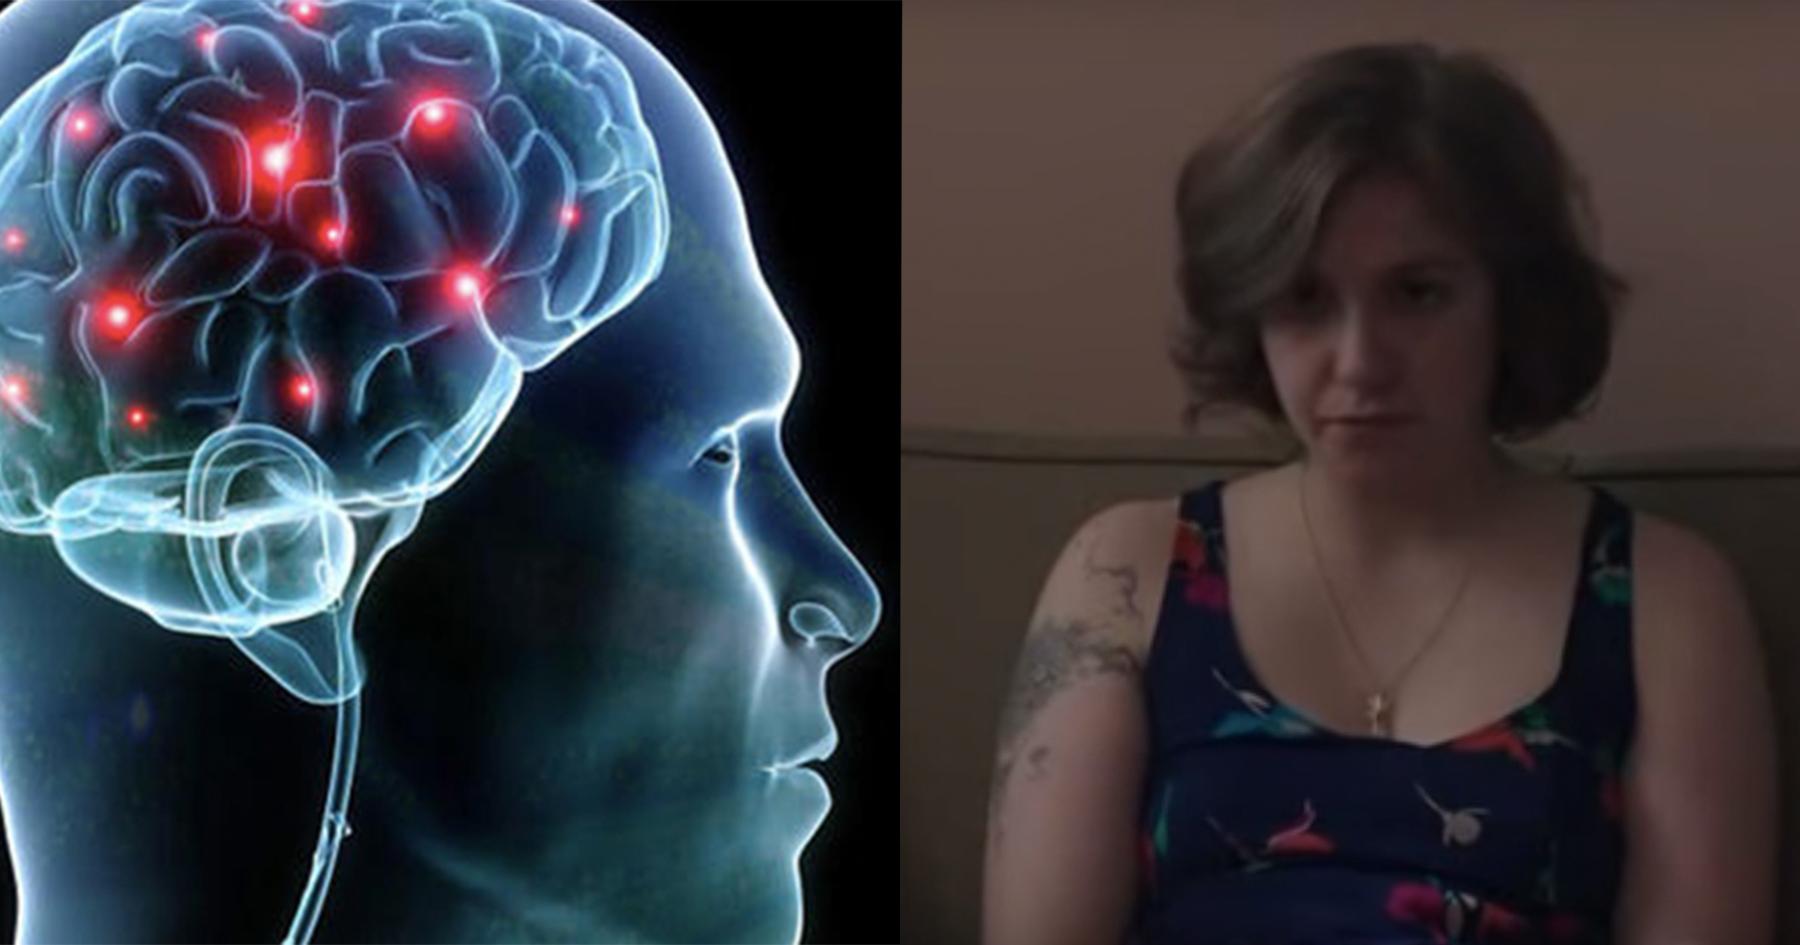 Lena-Dunham-and-brain